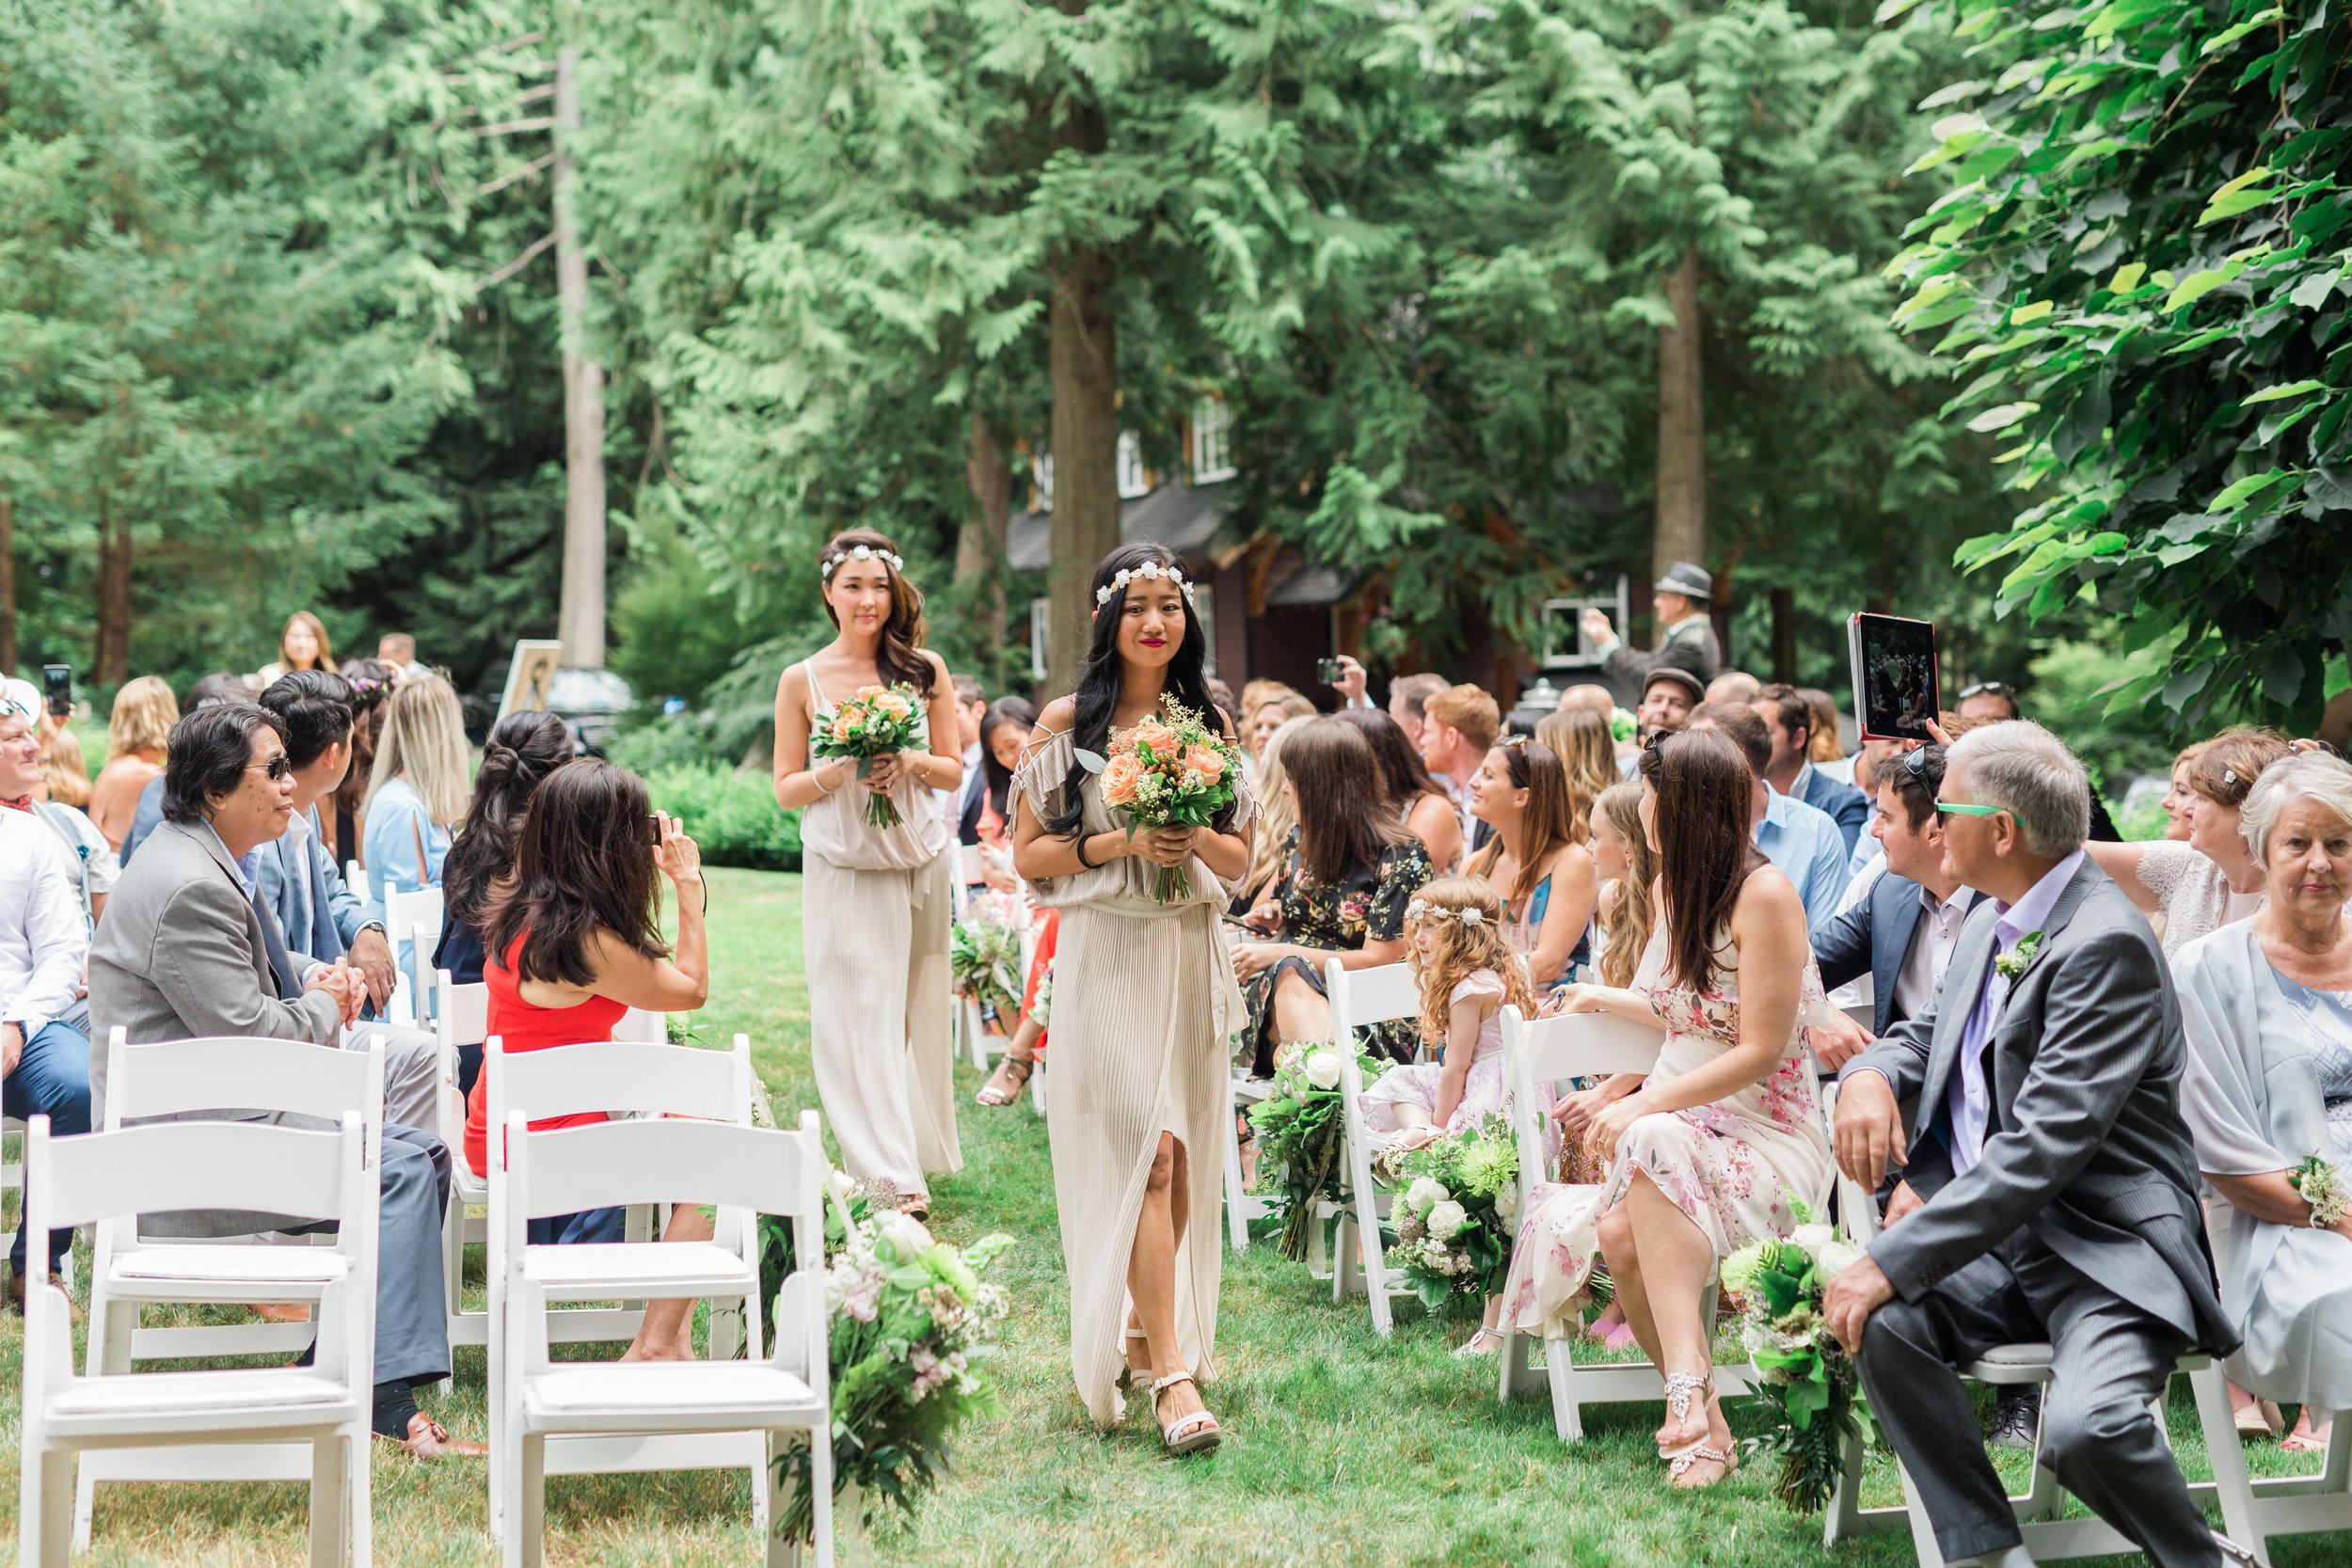 Linwood House Wedding Photos - Roberts Creek Wedding Photos - Vancouver Wedding Photographer & Videographer - Sunshine Coast Wedding Photos - Sunshine Coast Wedding Photographer - Jennifer Picard Photography - IMG_6219.jpg